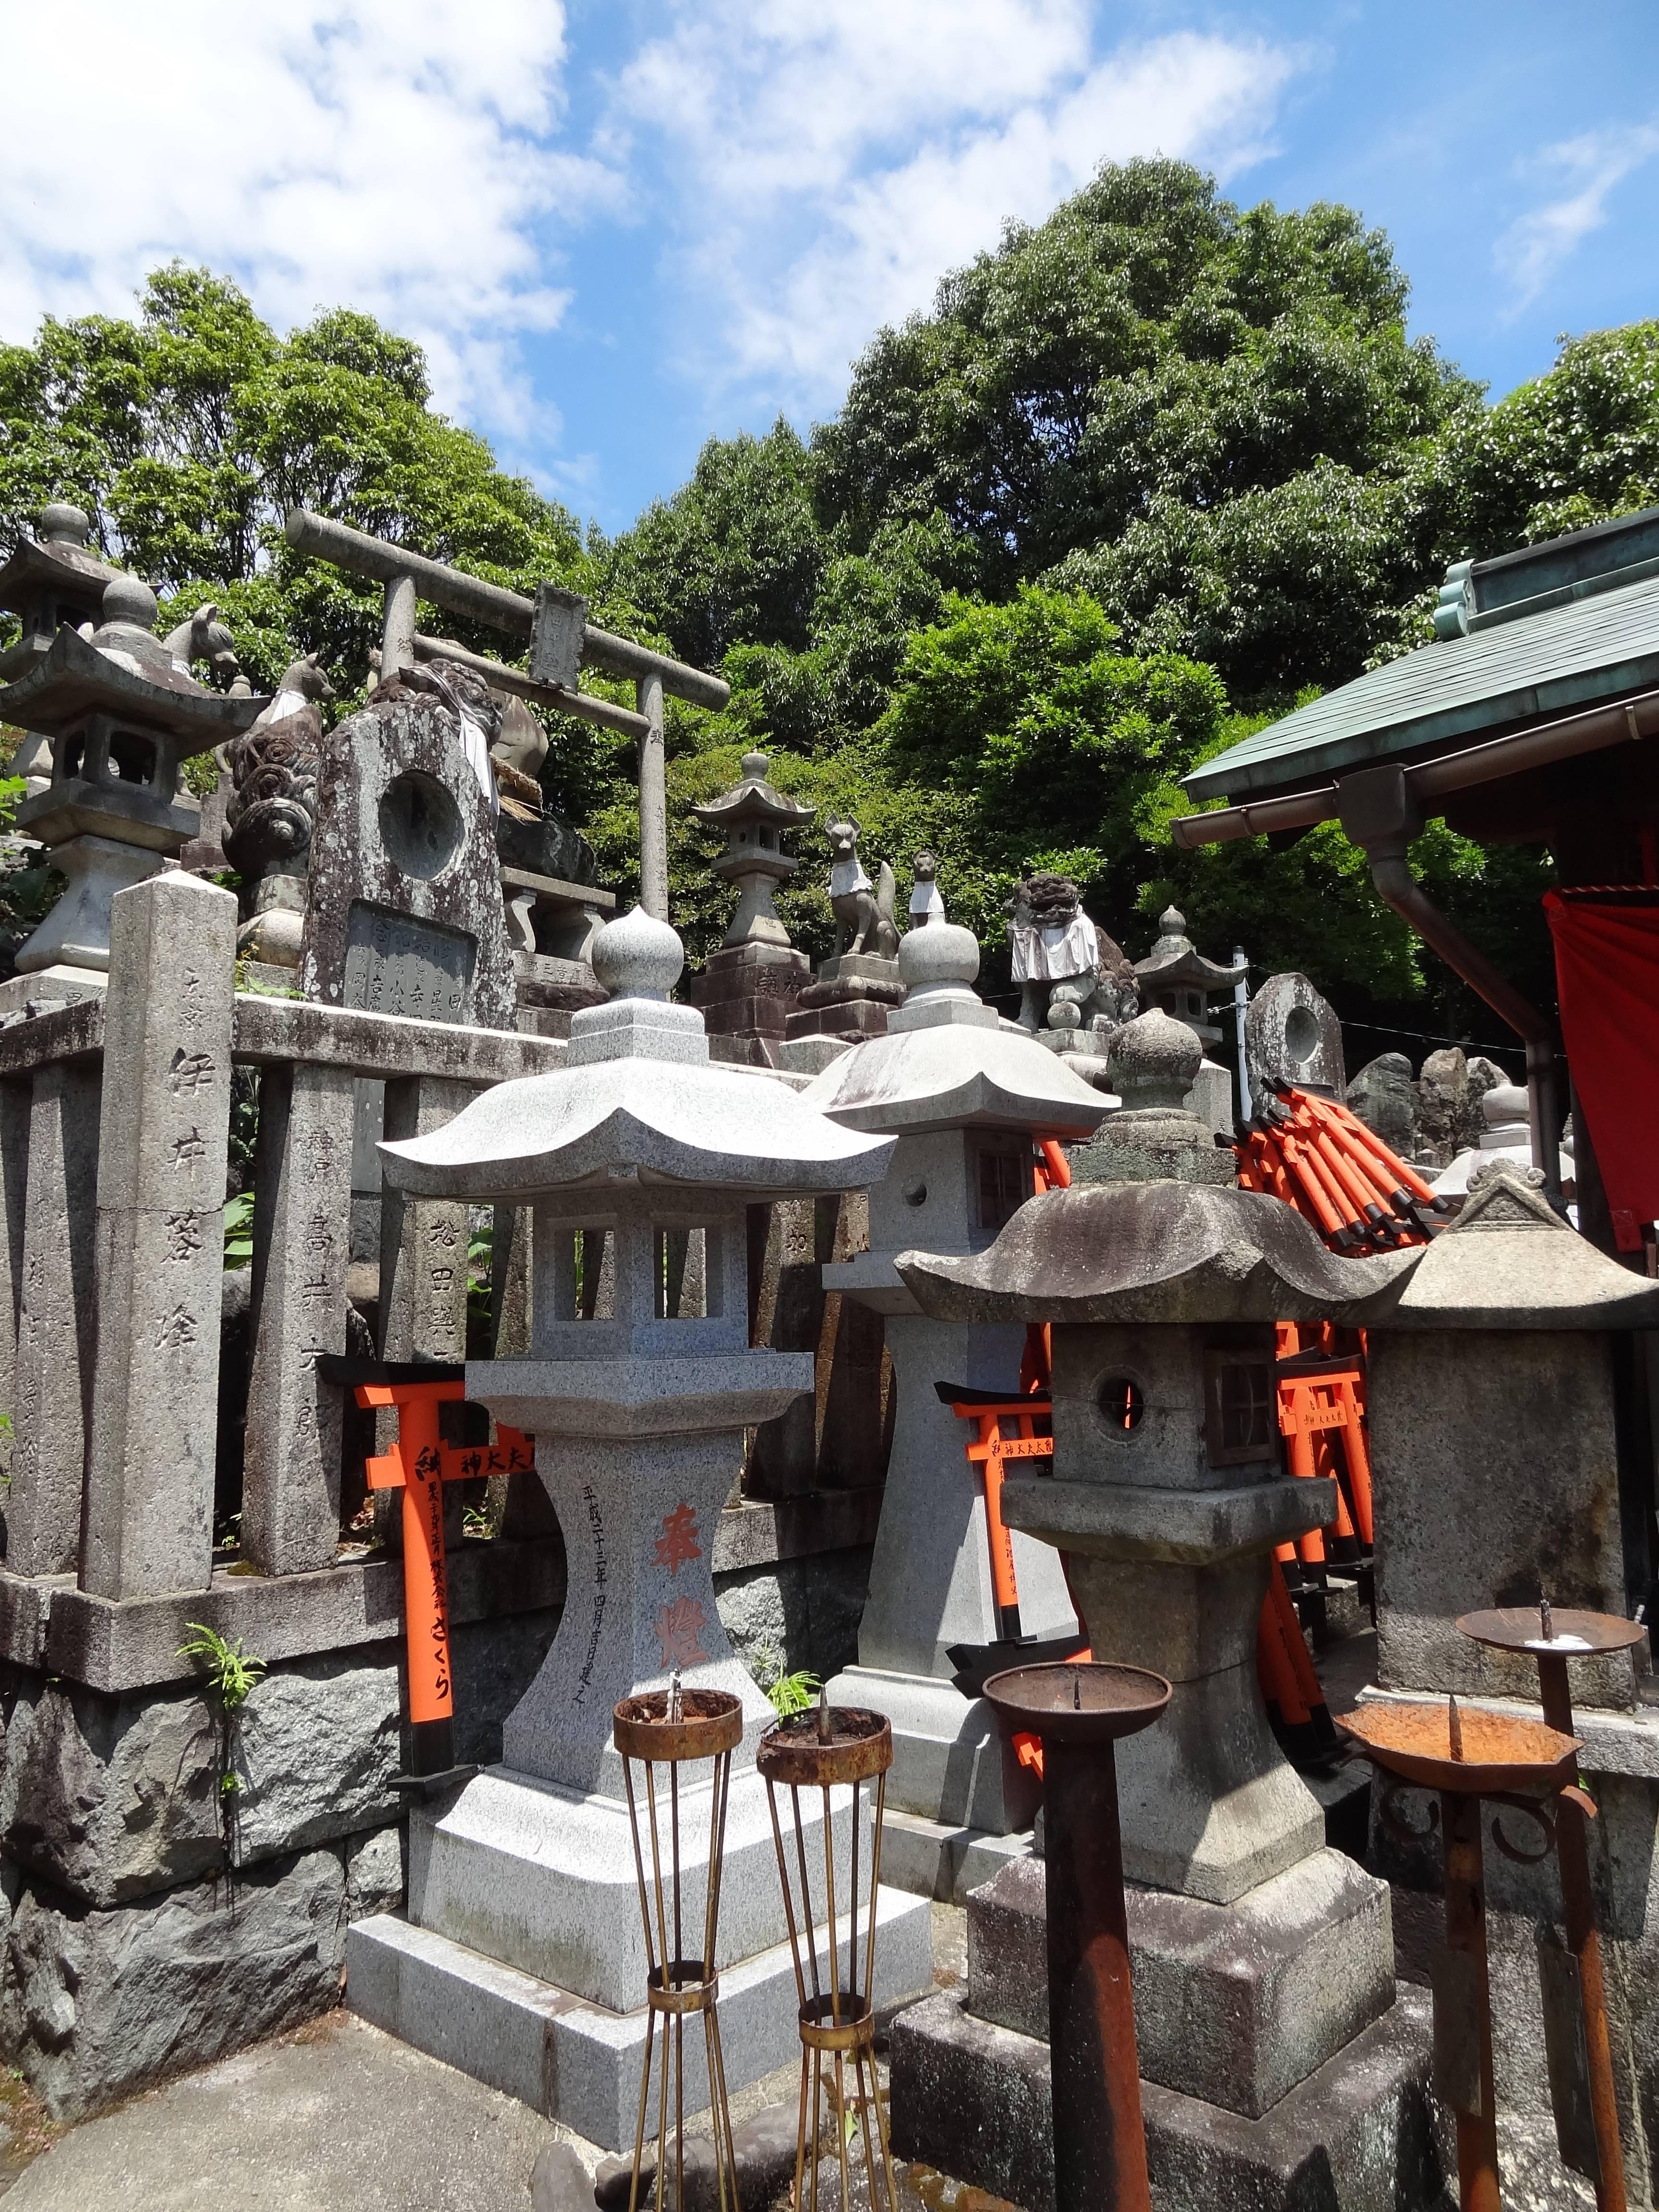 Photo 2: Le sanctuaire aux 10 000 torii, Fushimi Inari